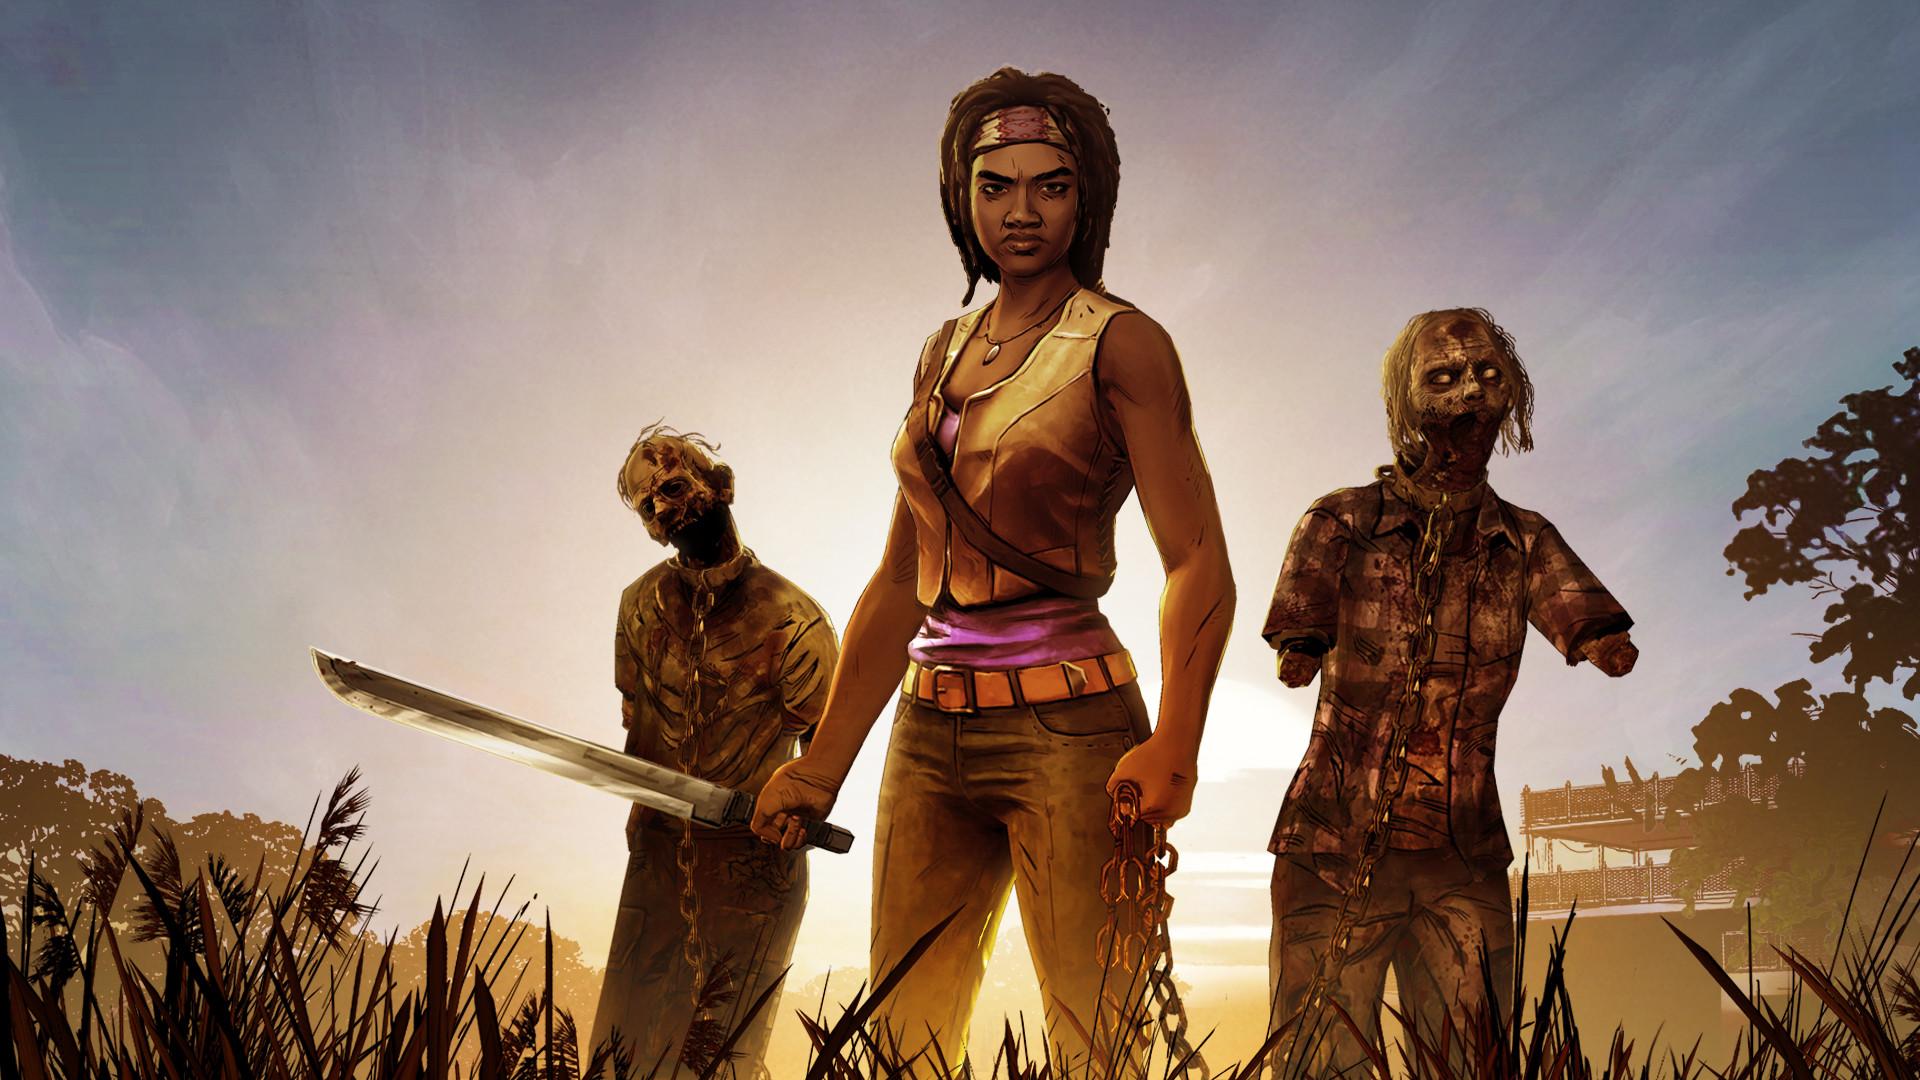 Wallpaper The walking dead, Michonne, A telltale games mini-series